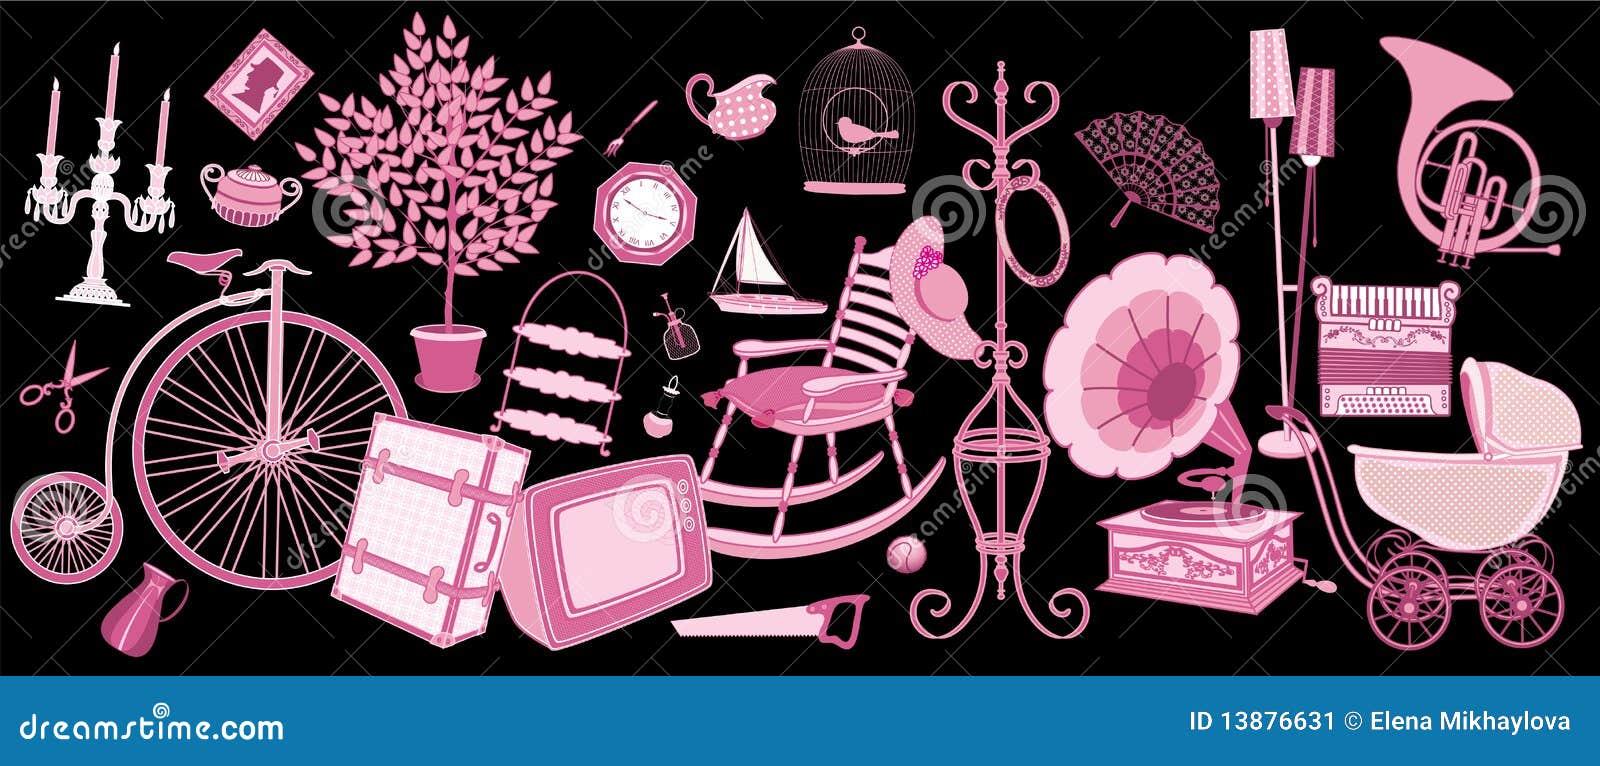 Suitcase Chair For Sale Flea Market Stock Image - Image: 13876631